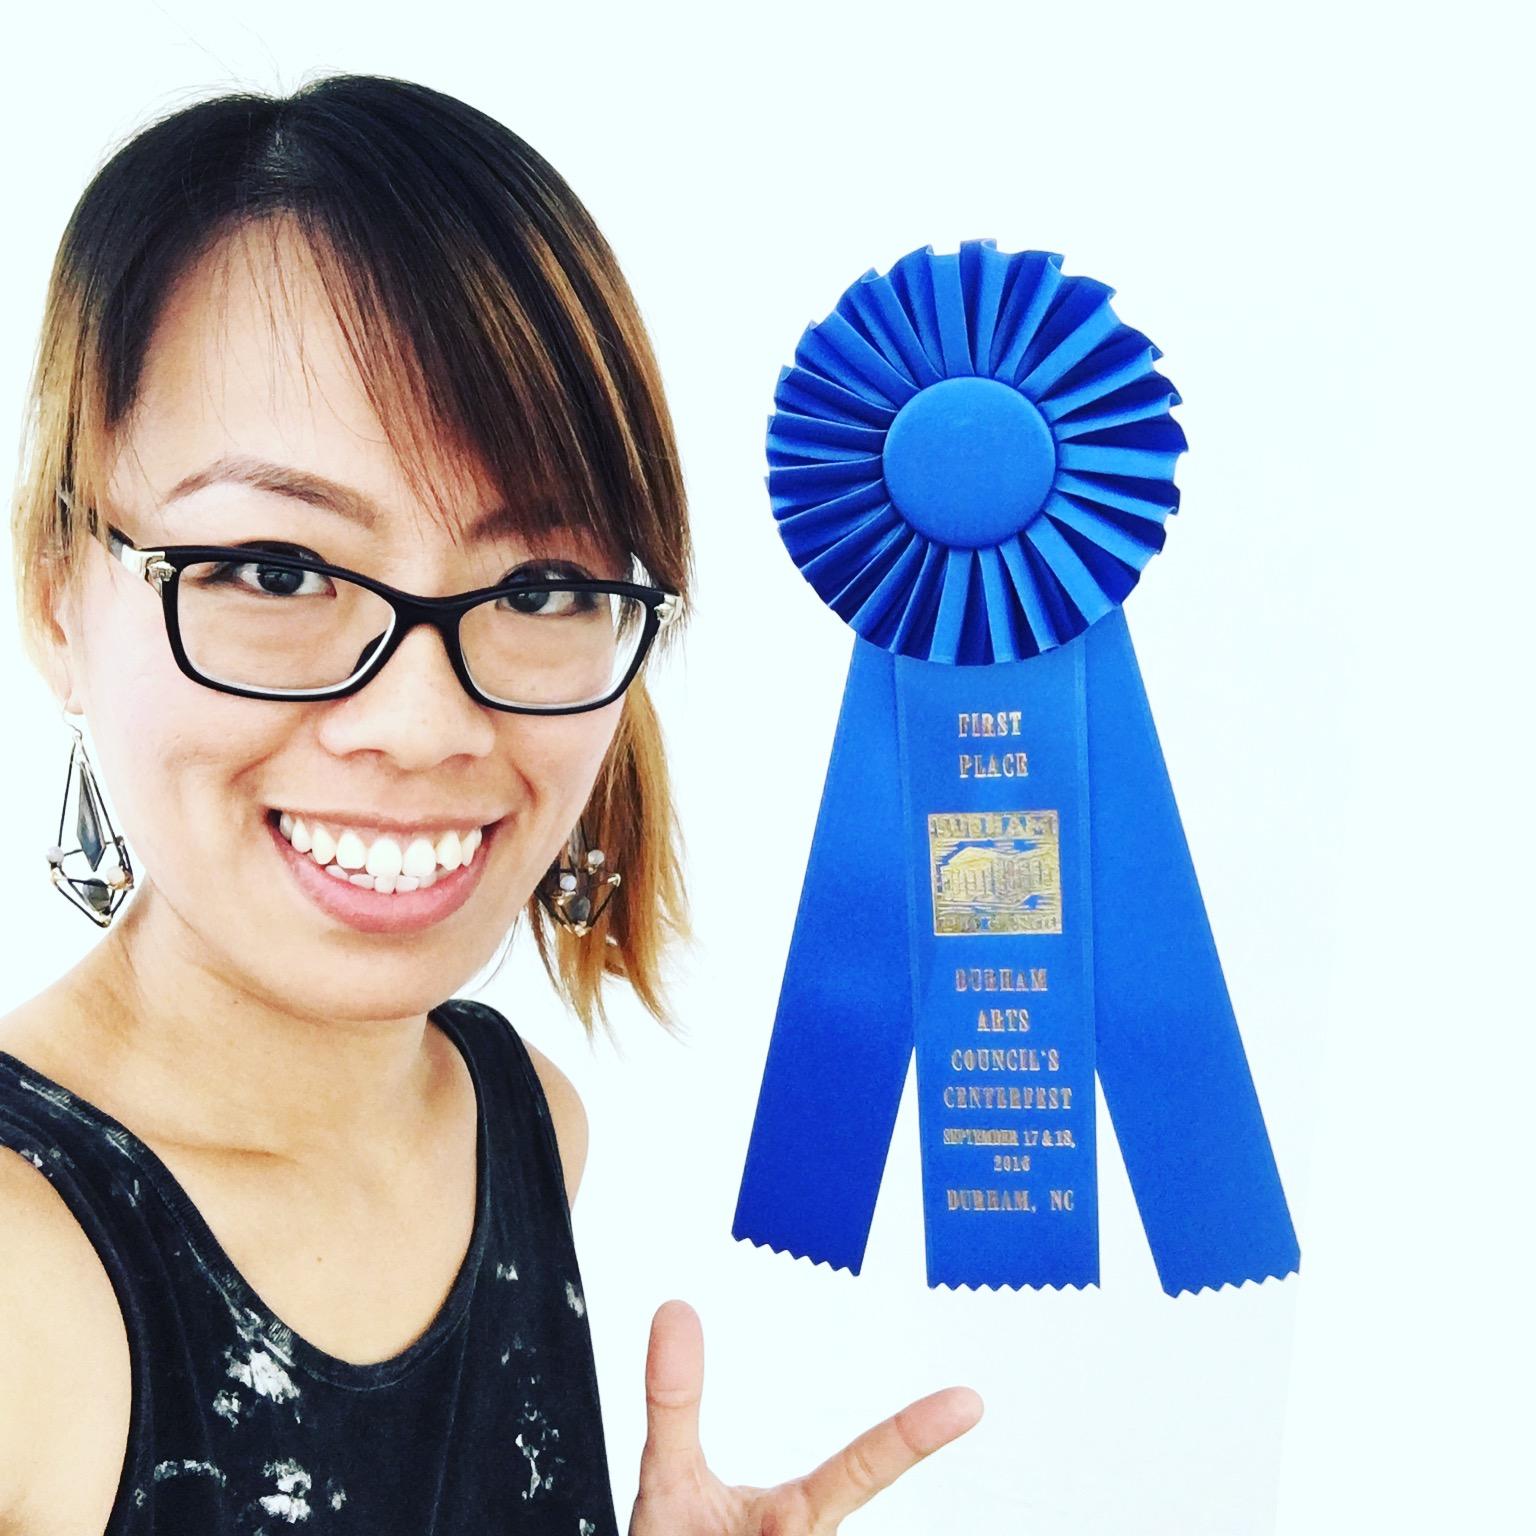 A winner deserves a selfie lol